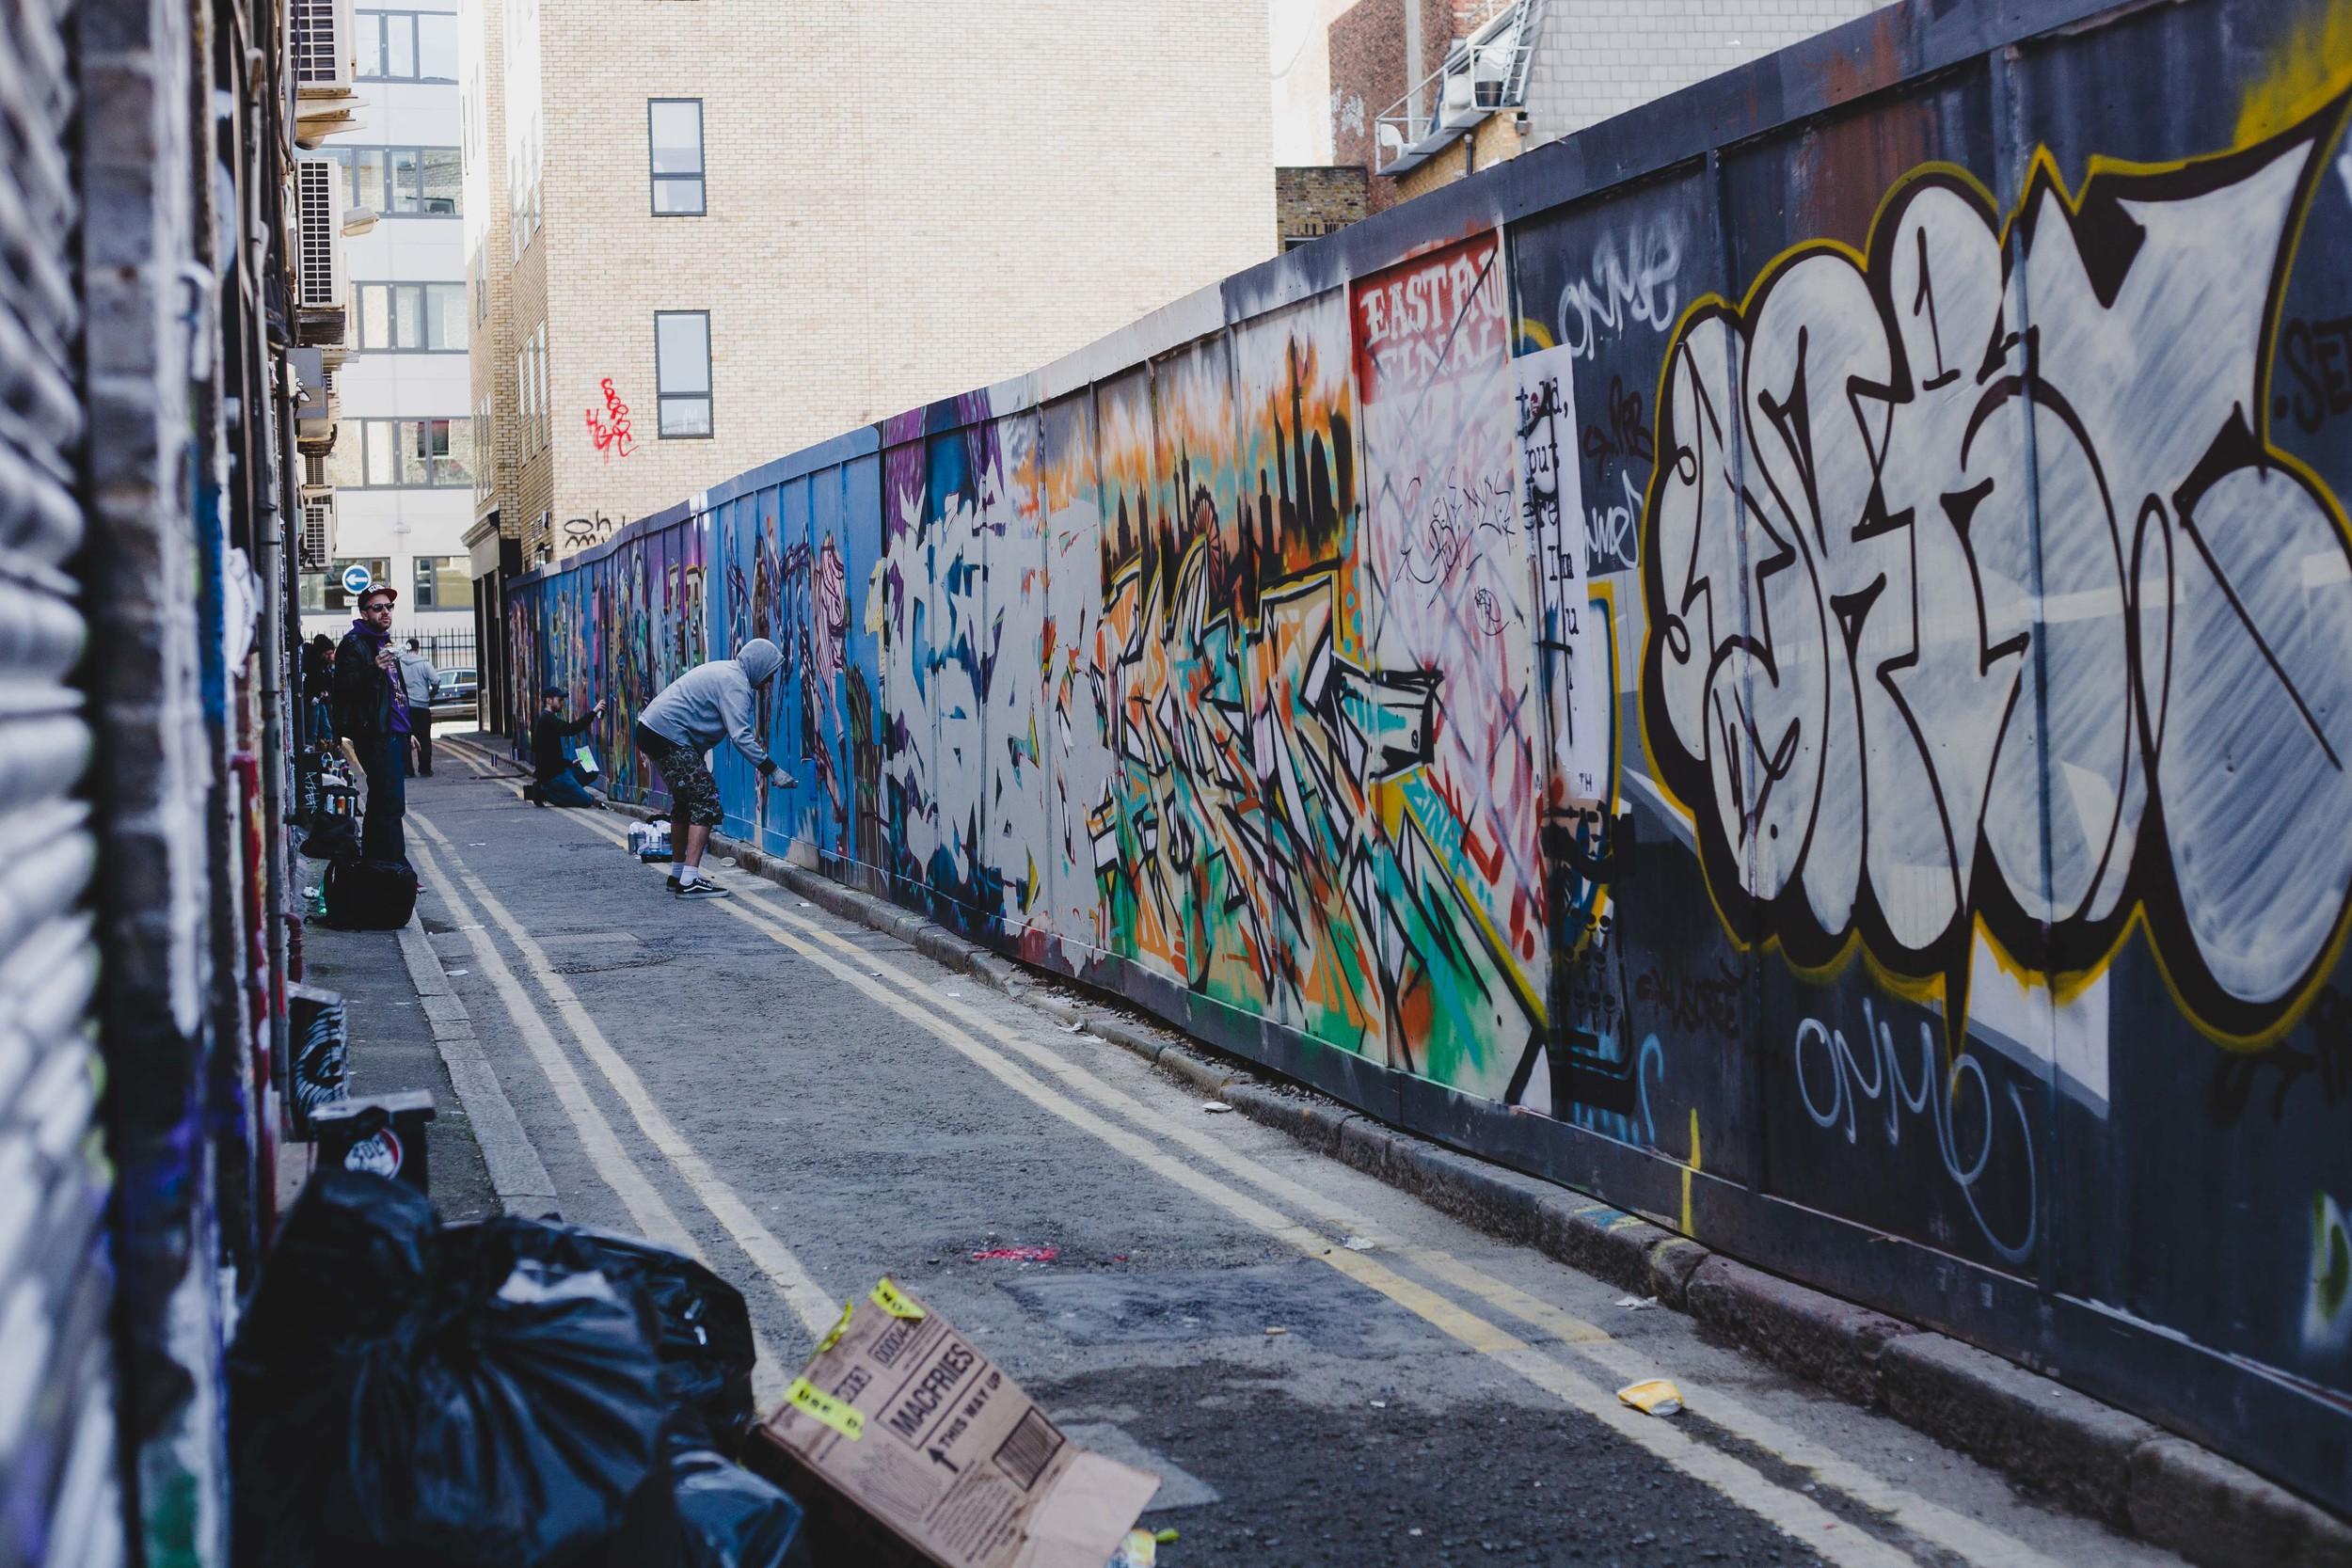 london-shoreditch-5238.jpg